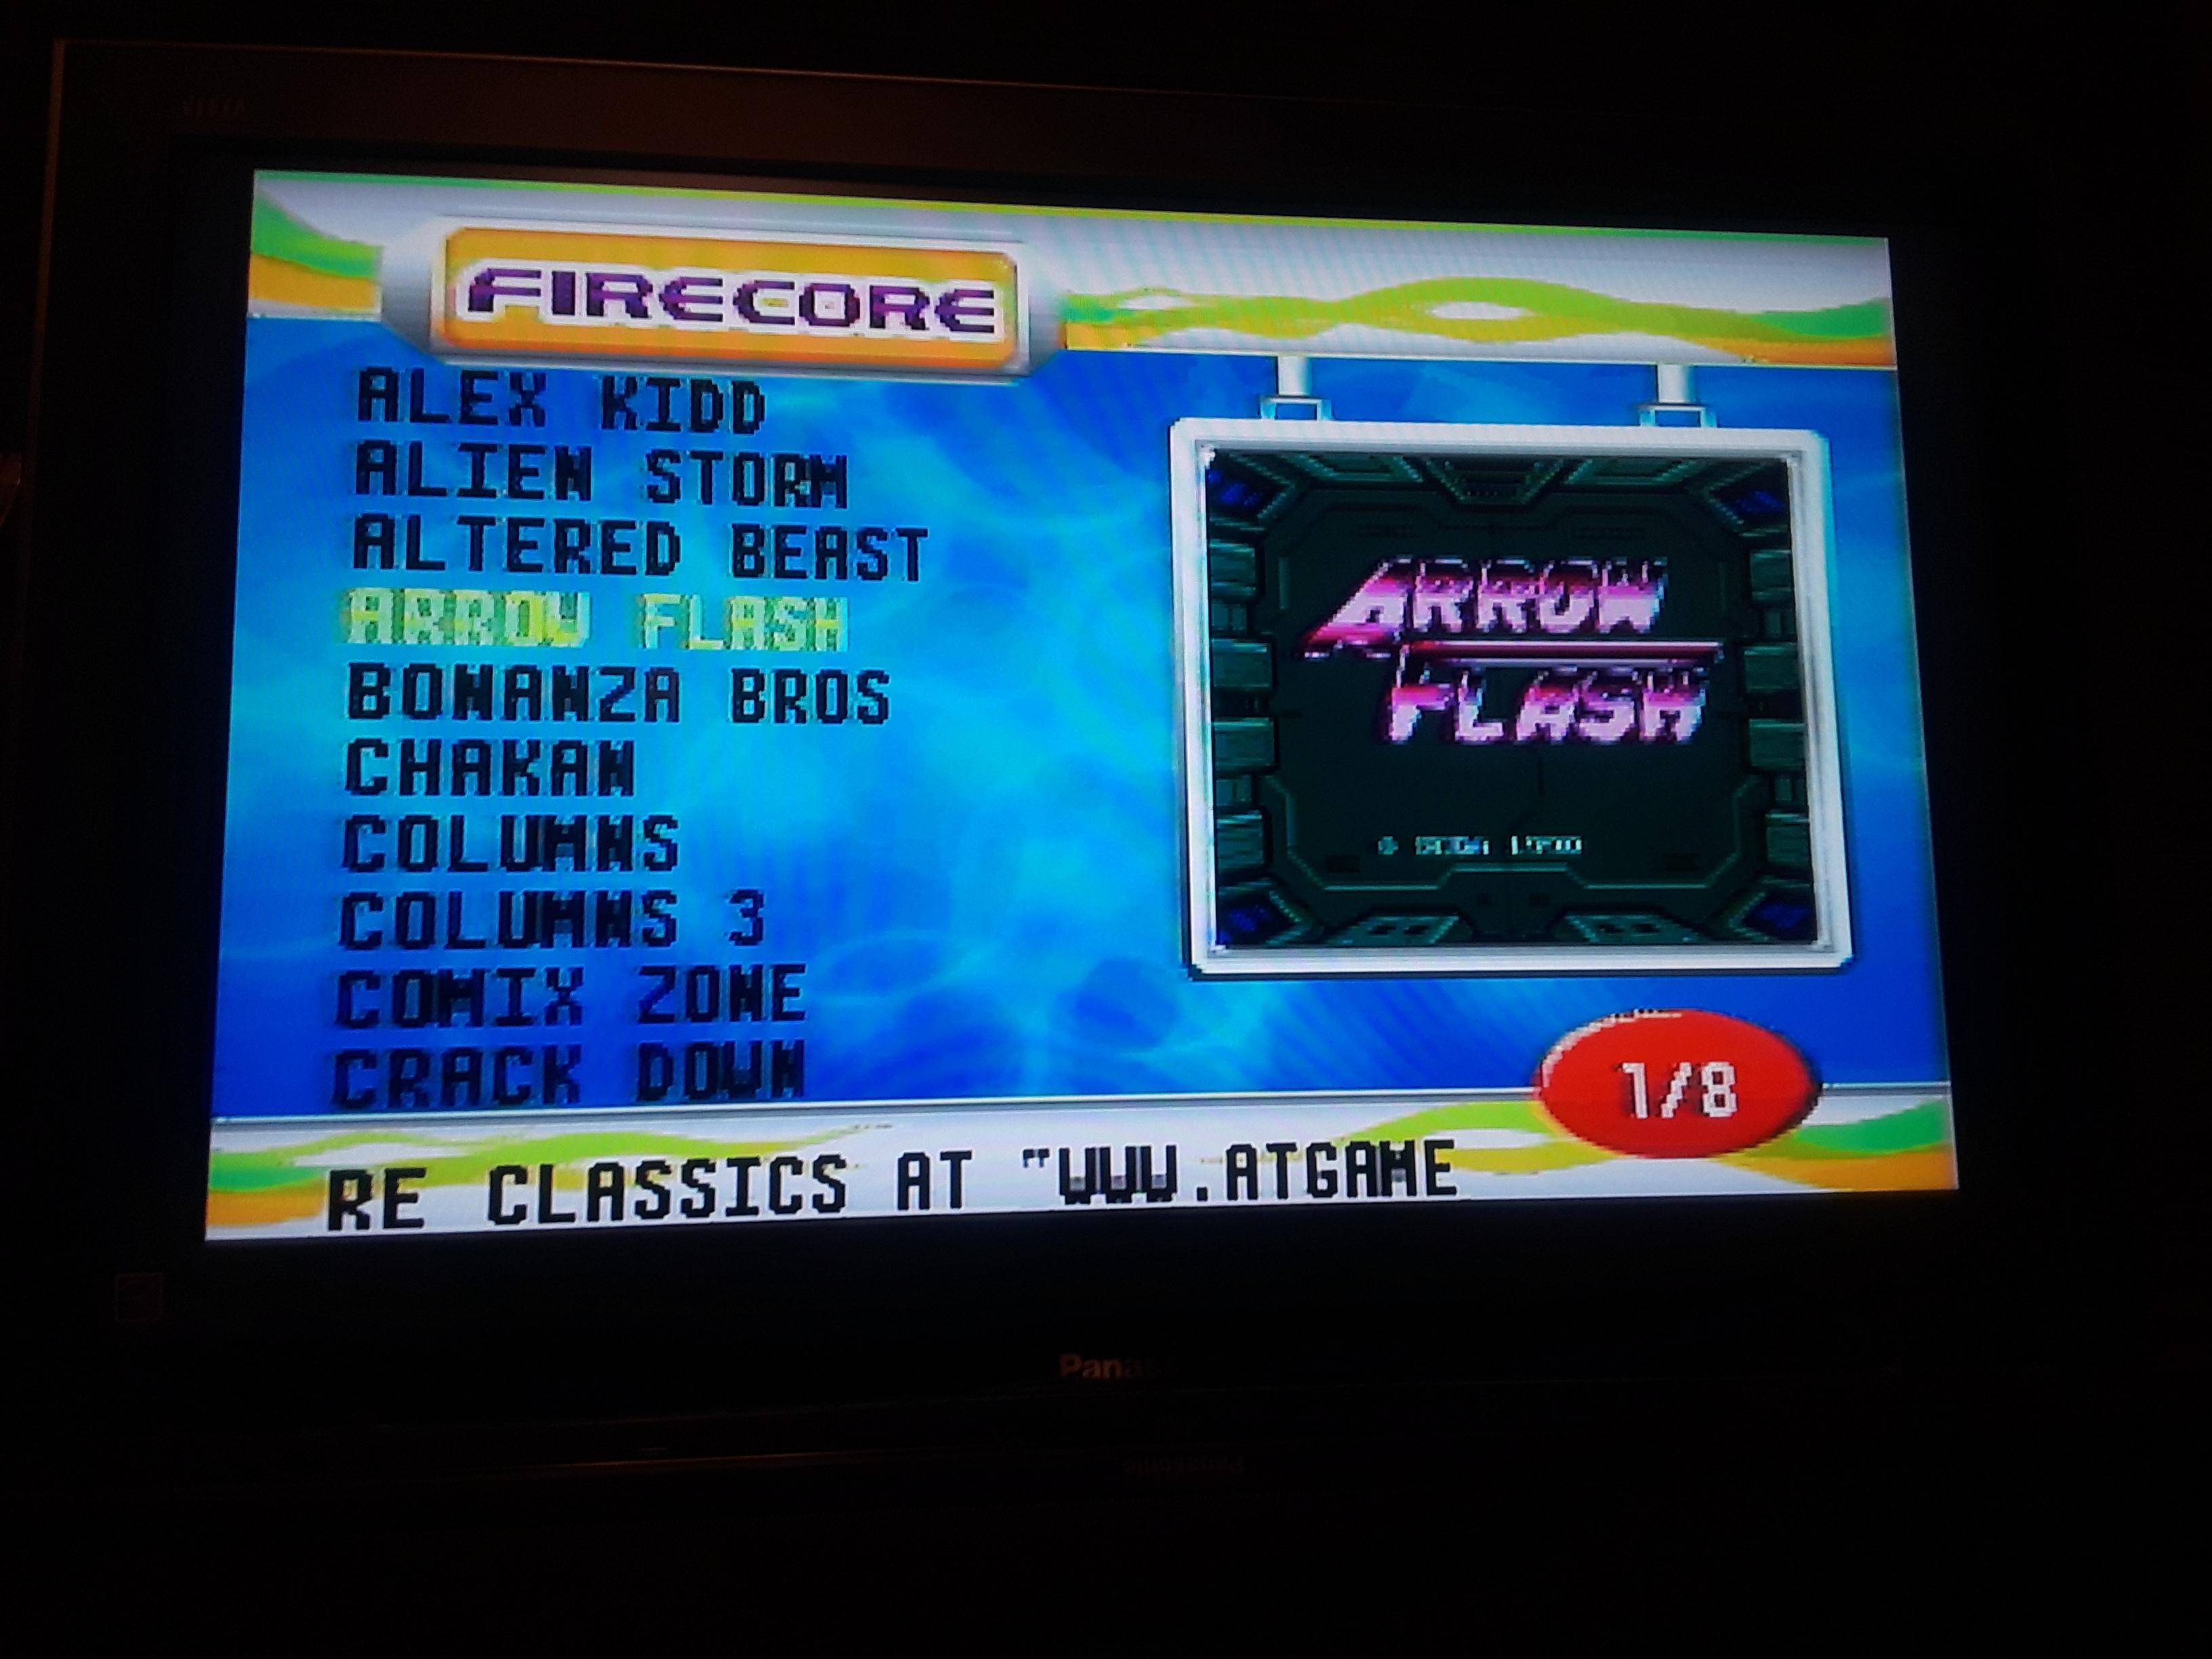 Arrow Flash [Hard / Auto Fire Allowed] 5,280 points